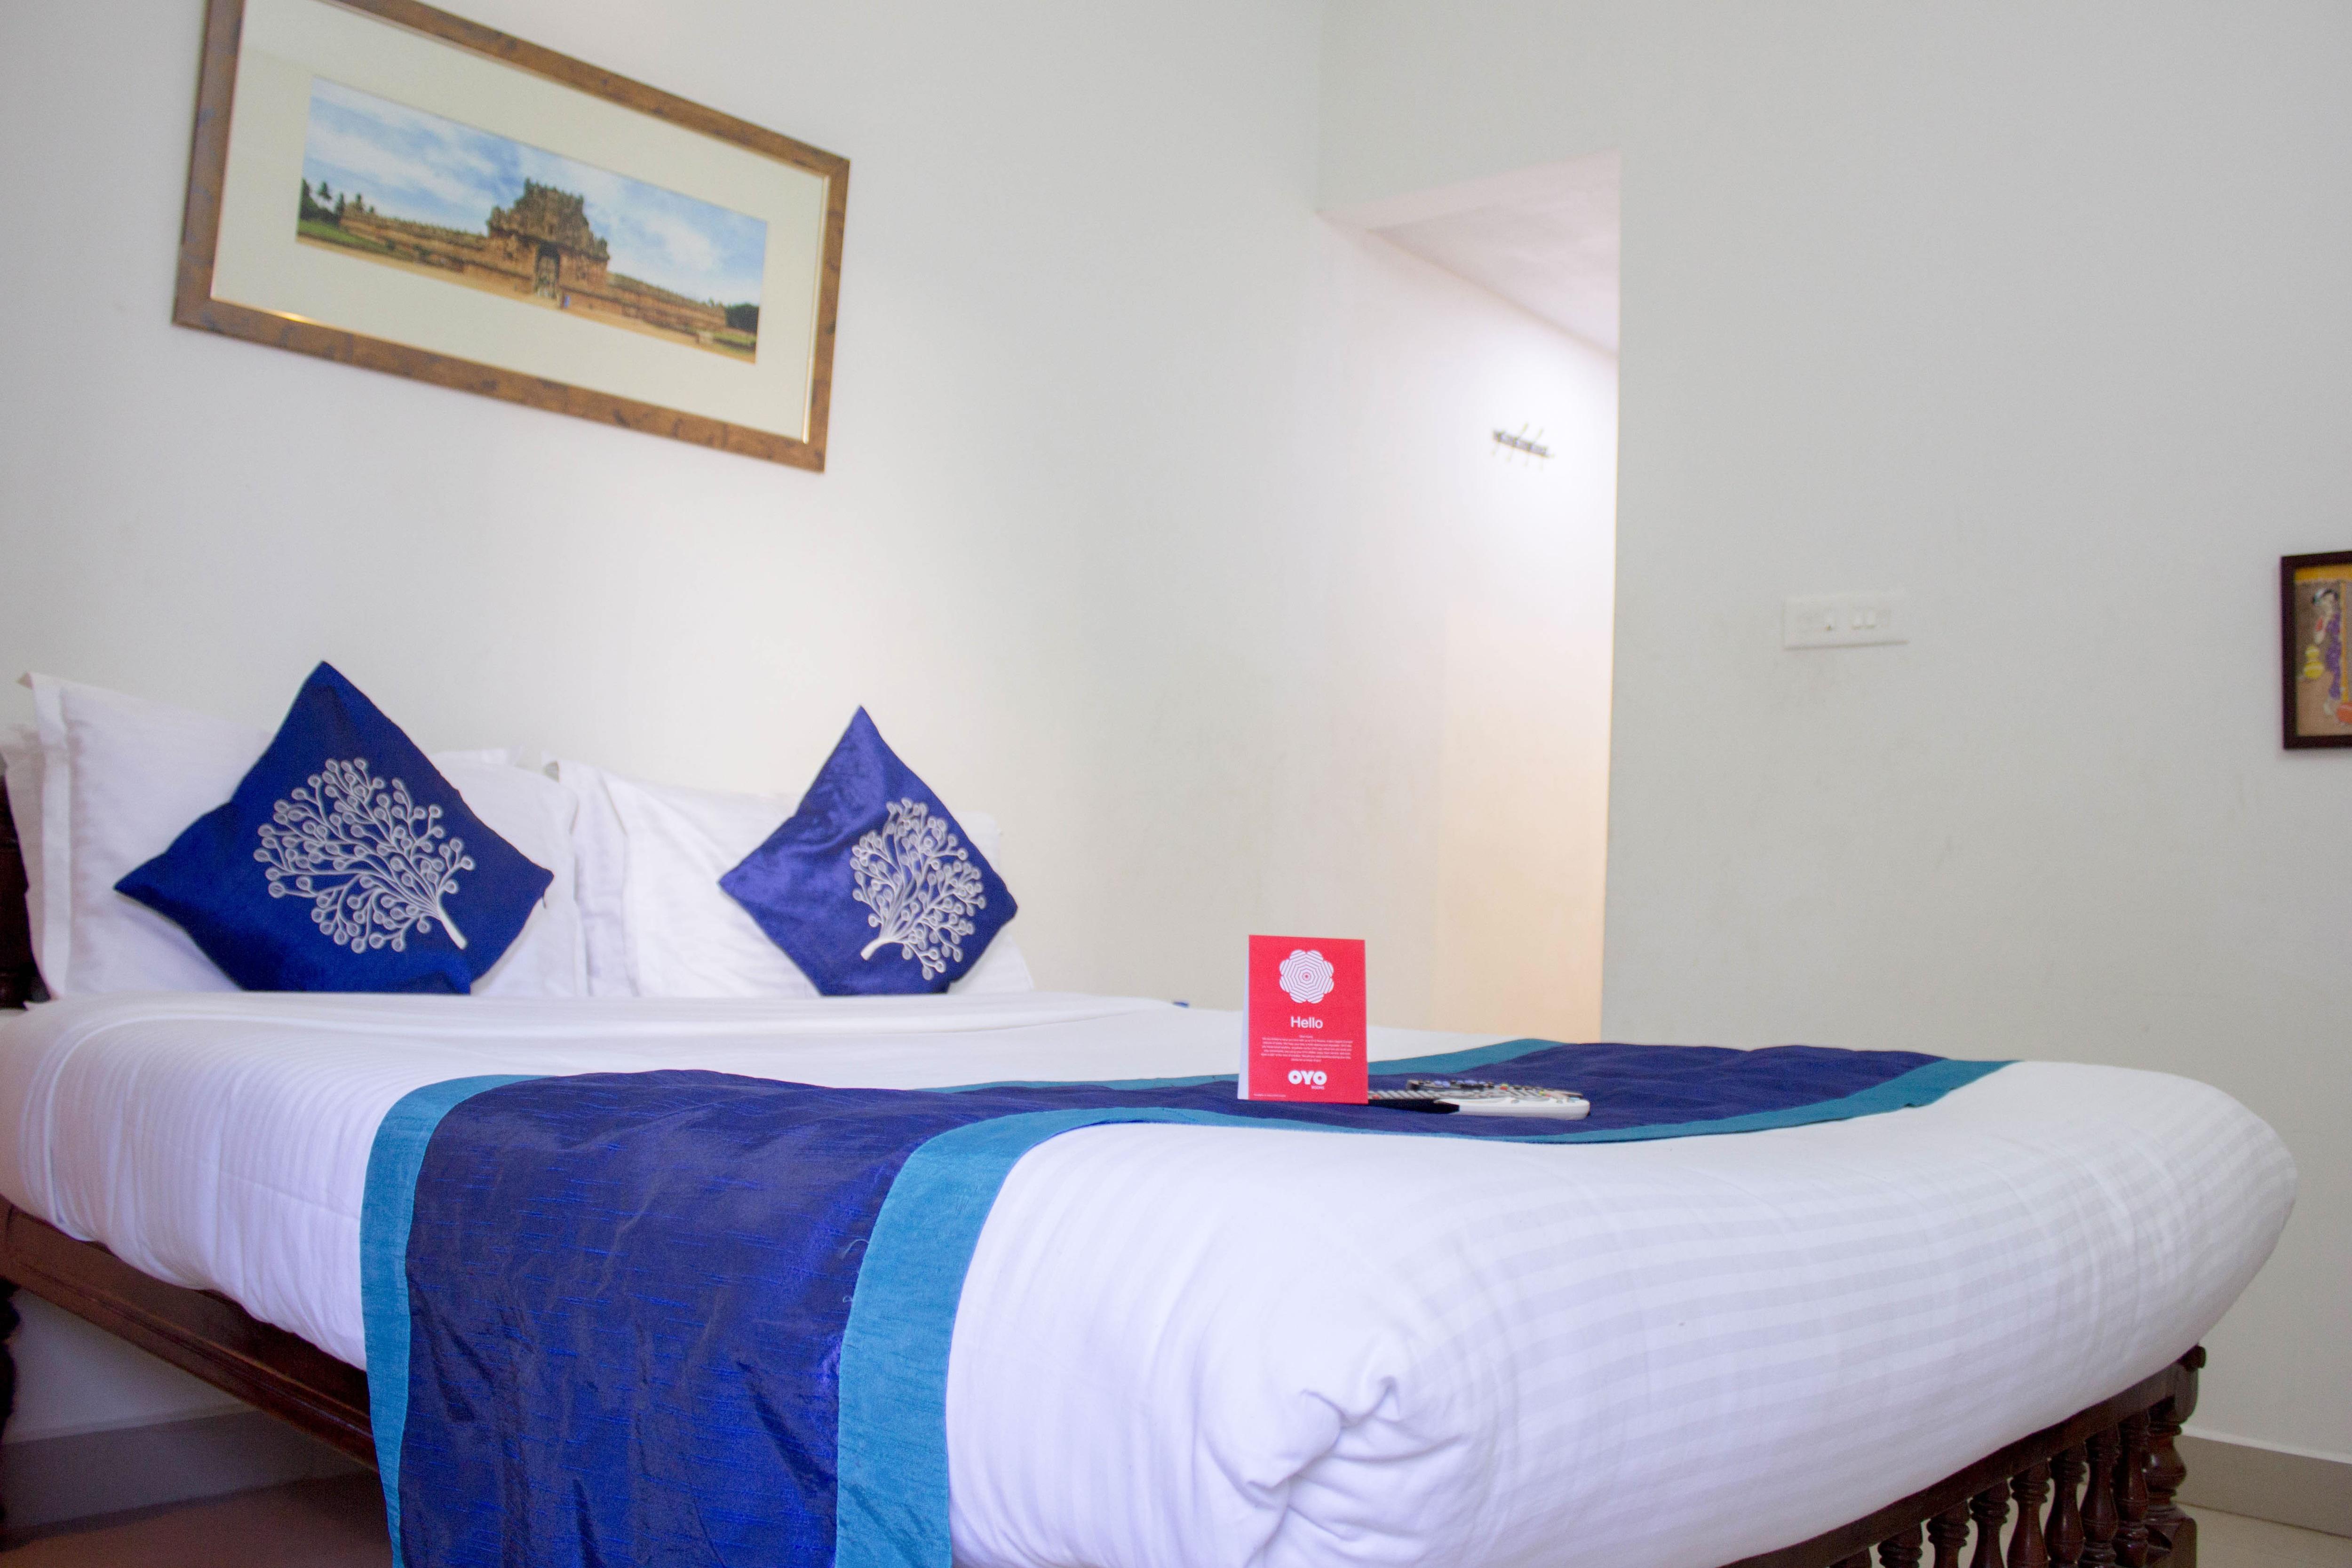 OYO 4238 Auro Mandir Residency in Pondicherry